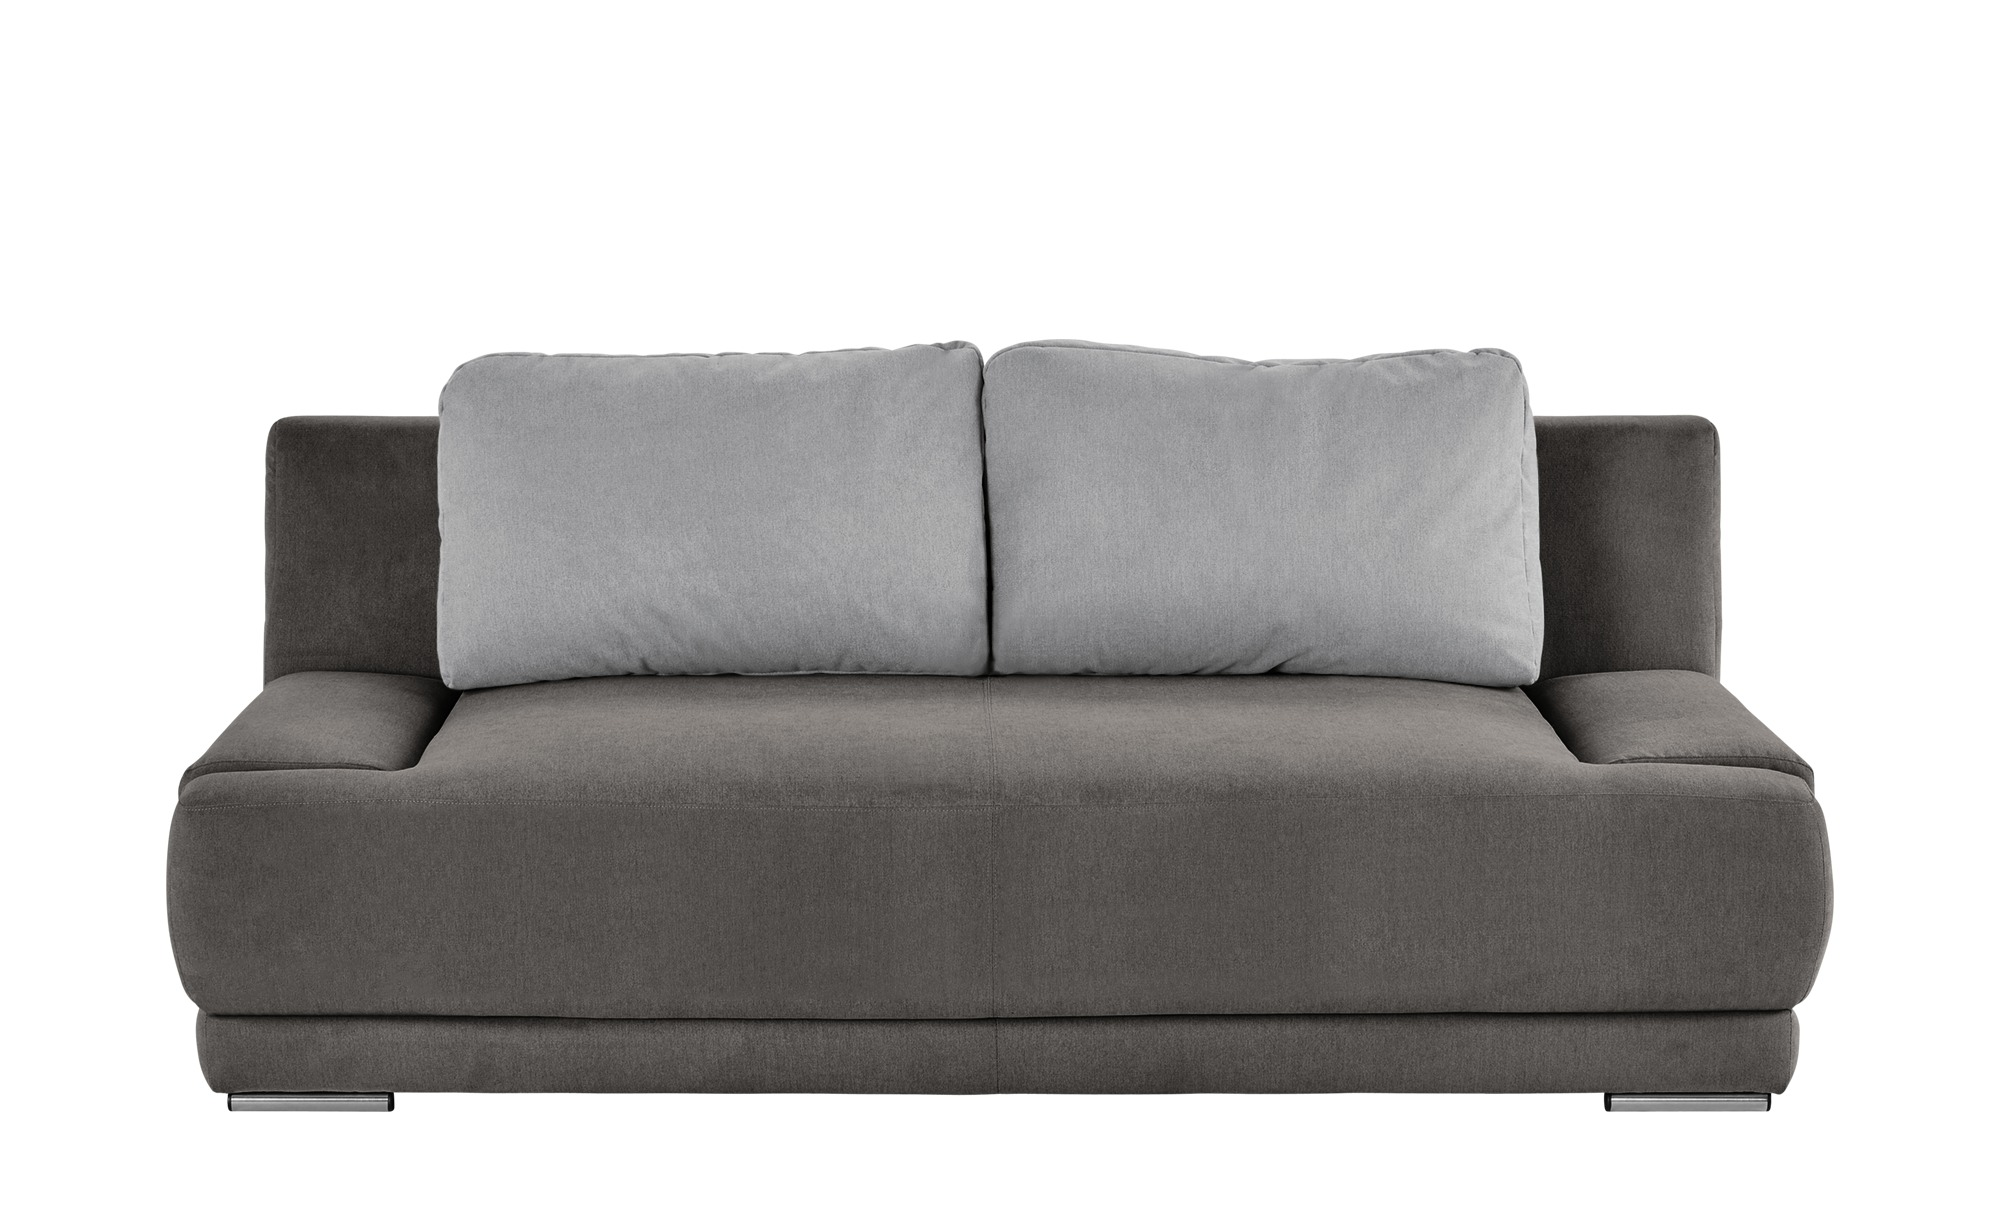 smart Schlafsofa braun/hellgrau - Flachgewebe Regina ¦ grau ¦ Maße (cm): B: 206 H: 83 T: 98 Polstermöbel > Sofas > 2-Sitzer - Höffner